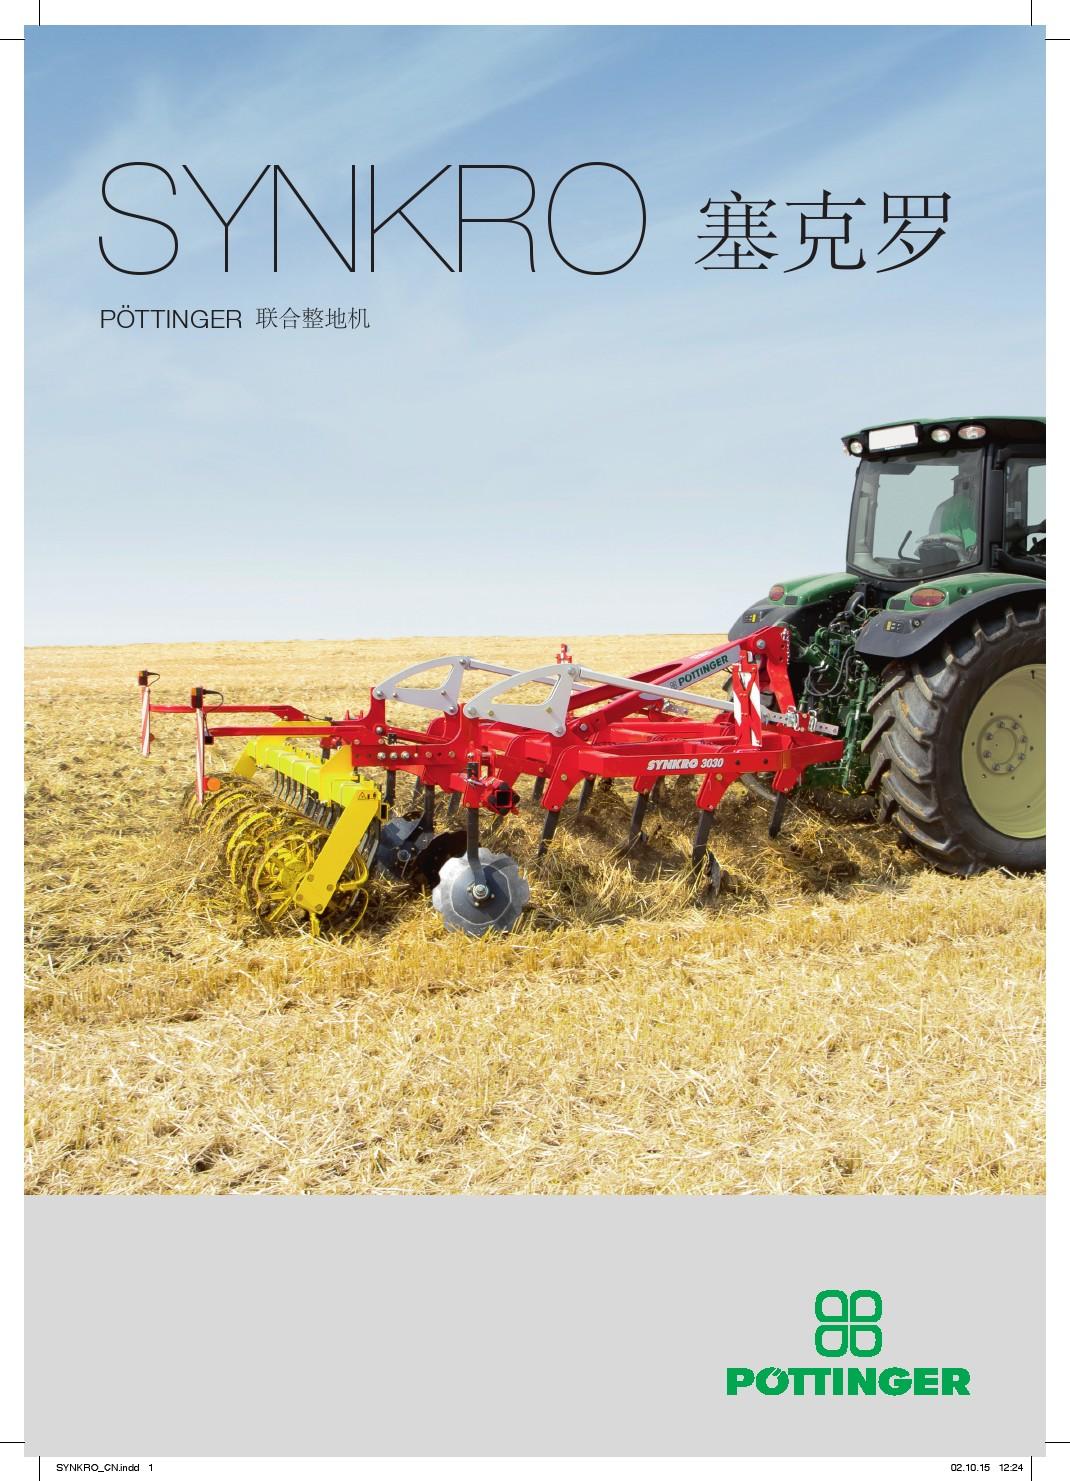 SYNKRO_CN联合整地机